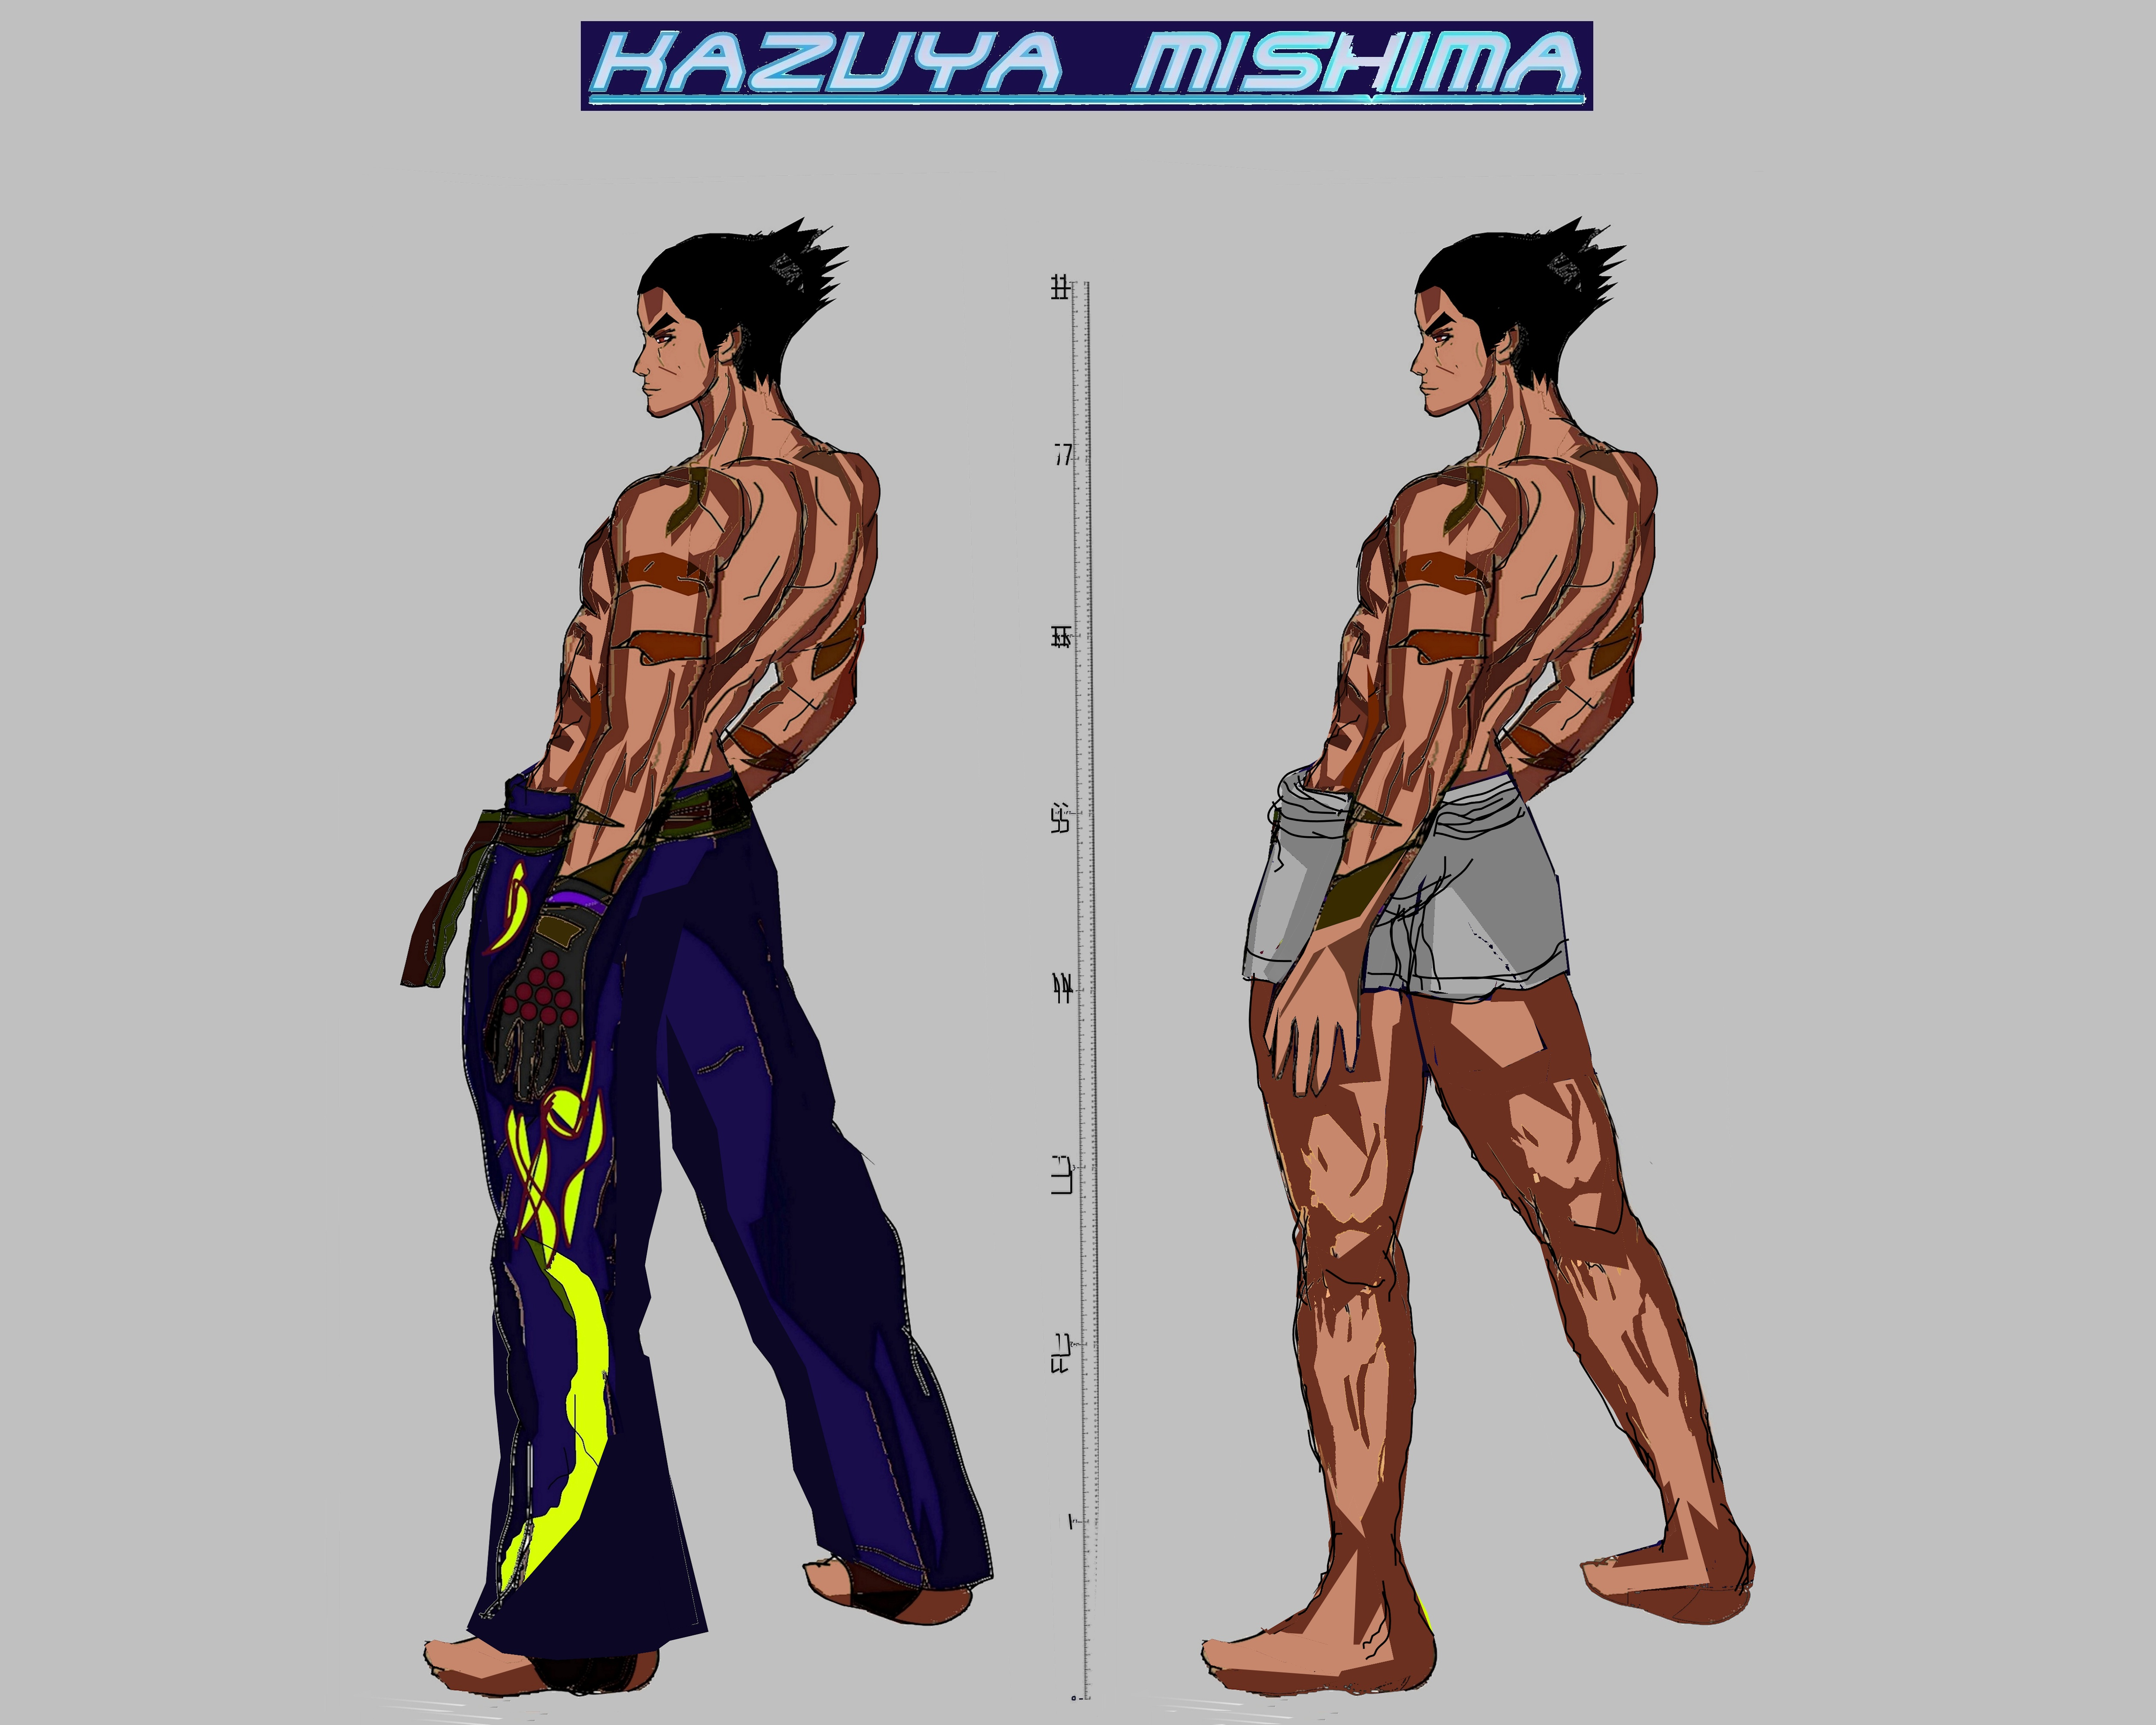 Tekken 7 - Kazuya Mishima by LA-Laker